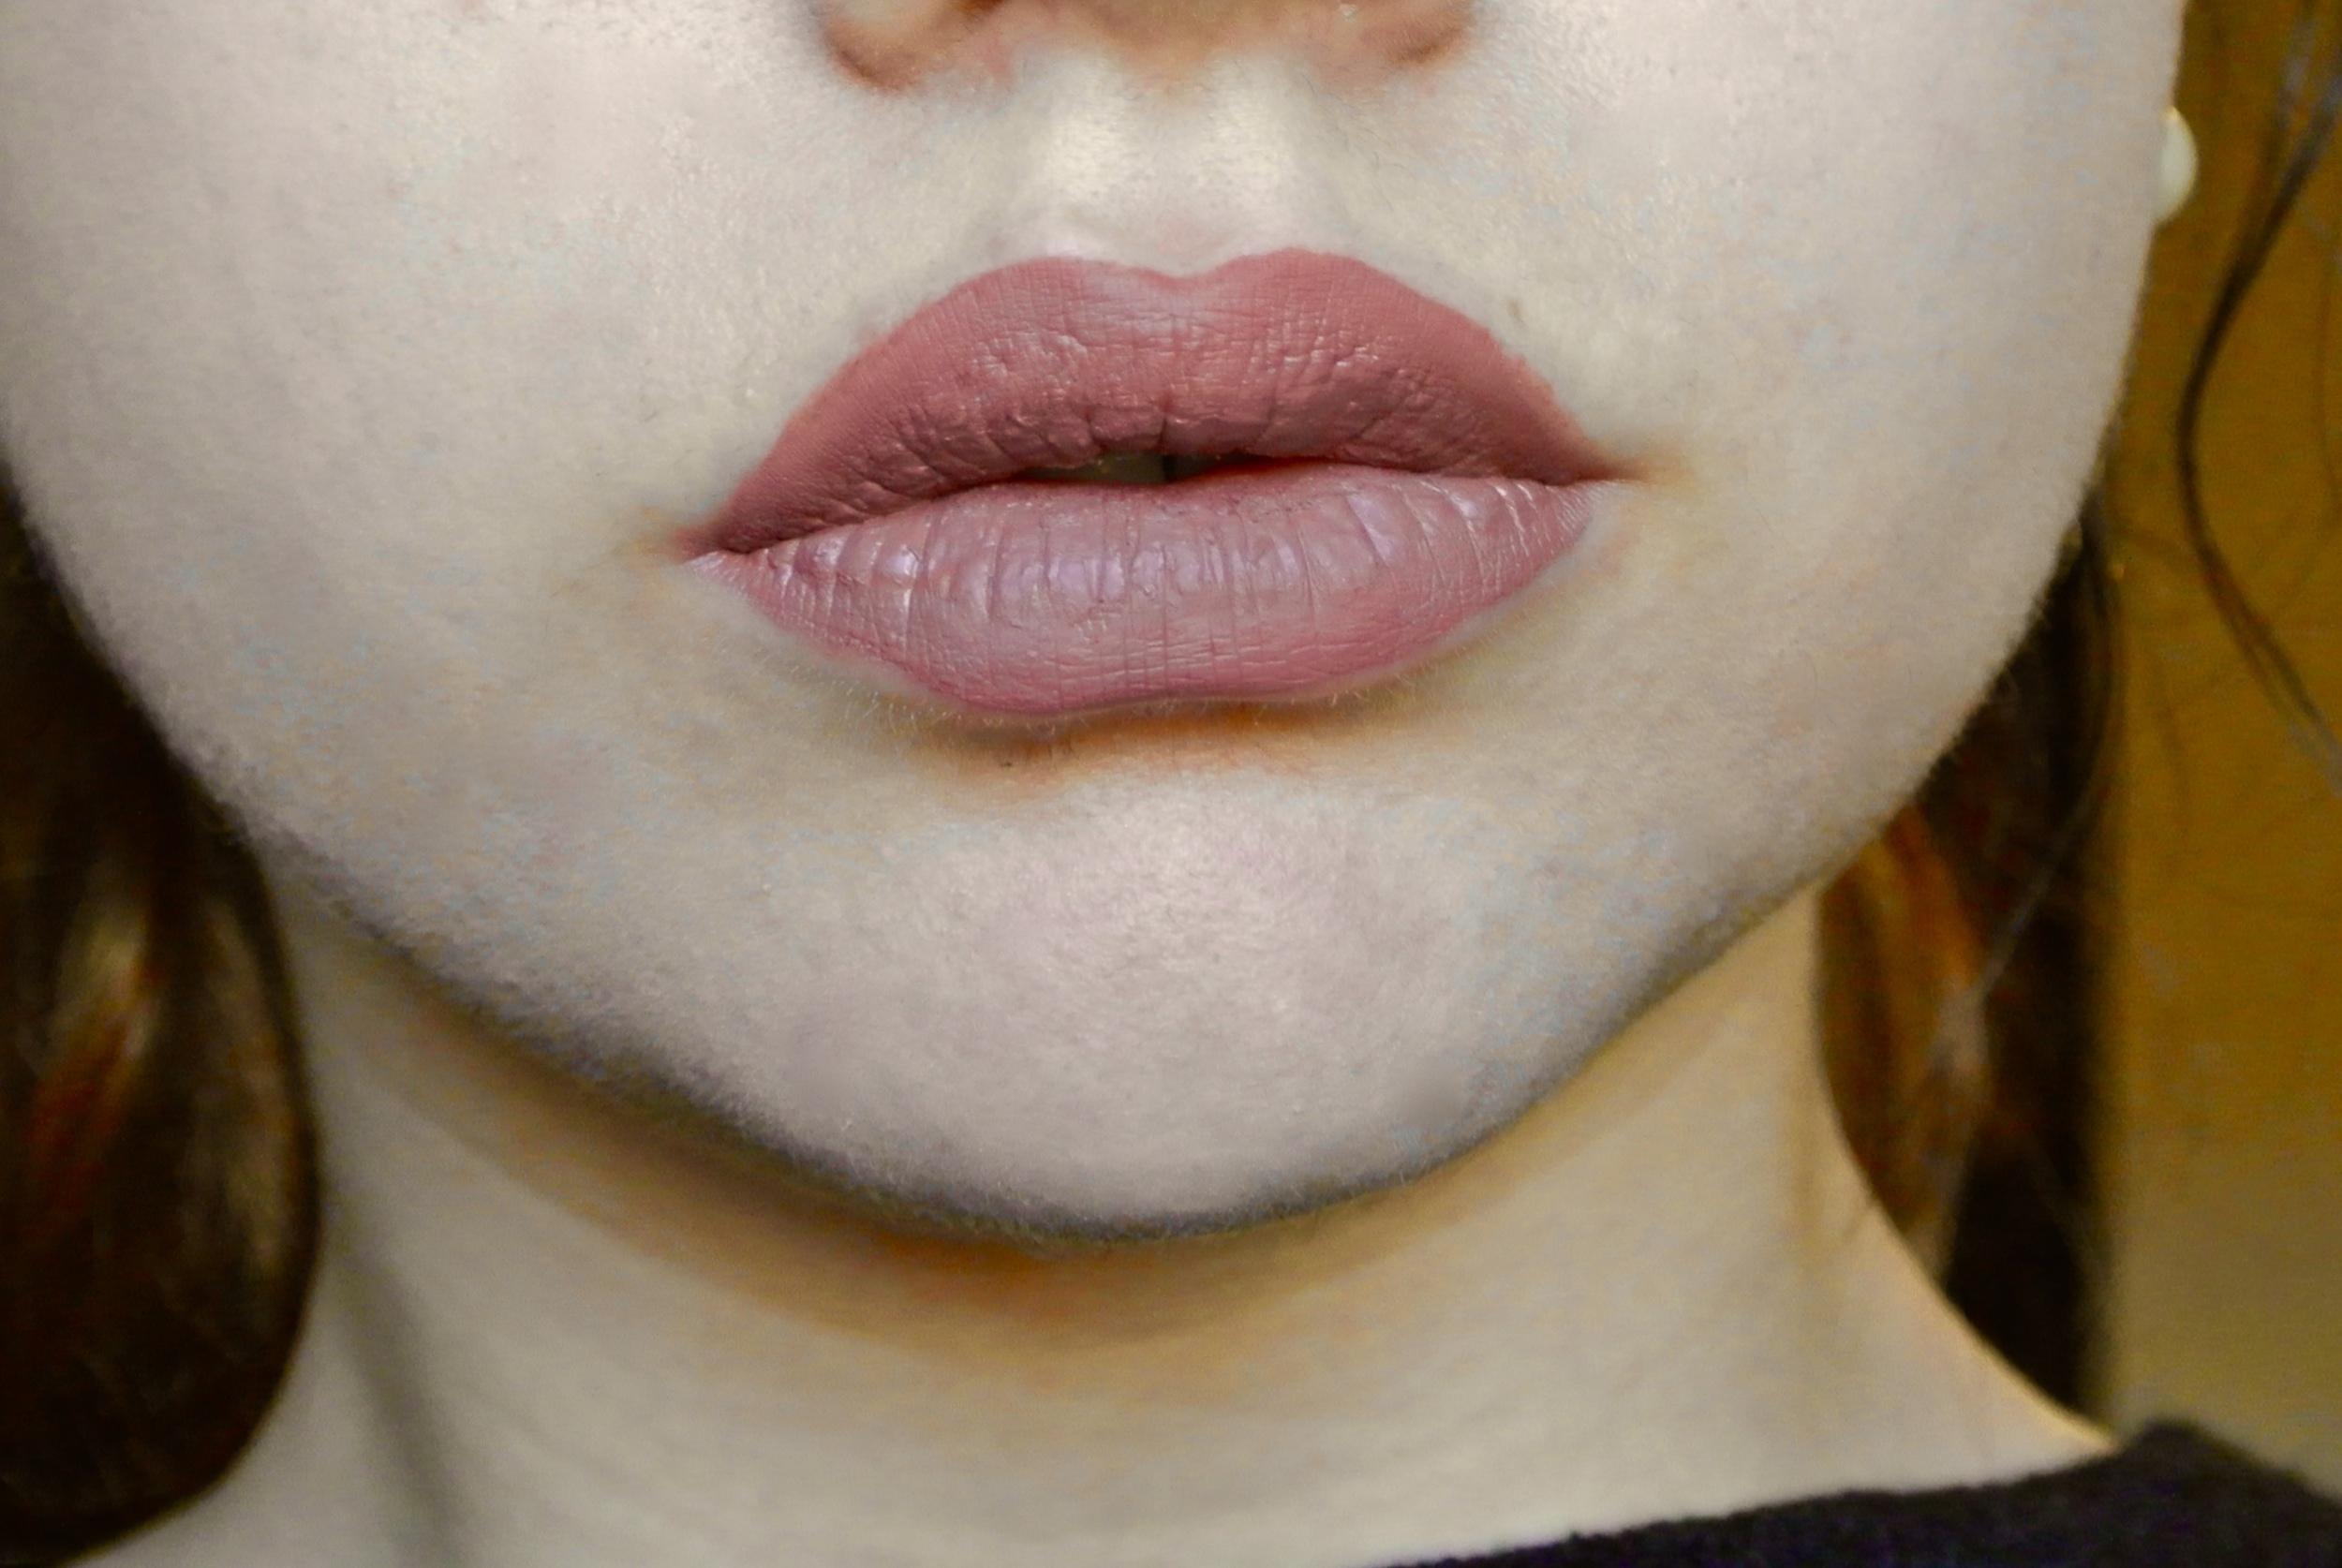 Colourpop Beeper Liquid Lipstick